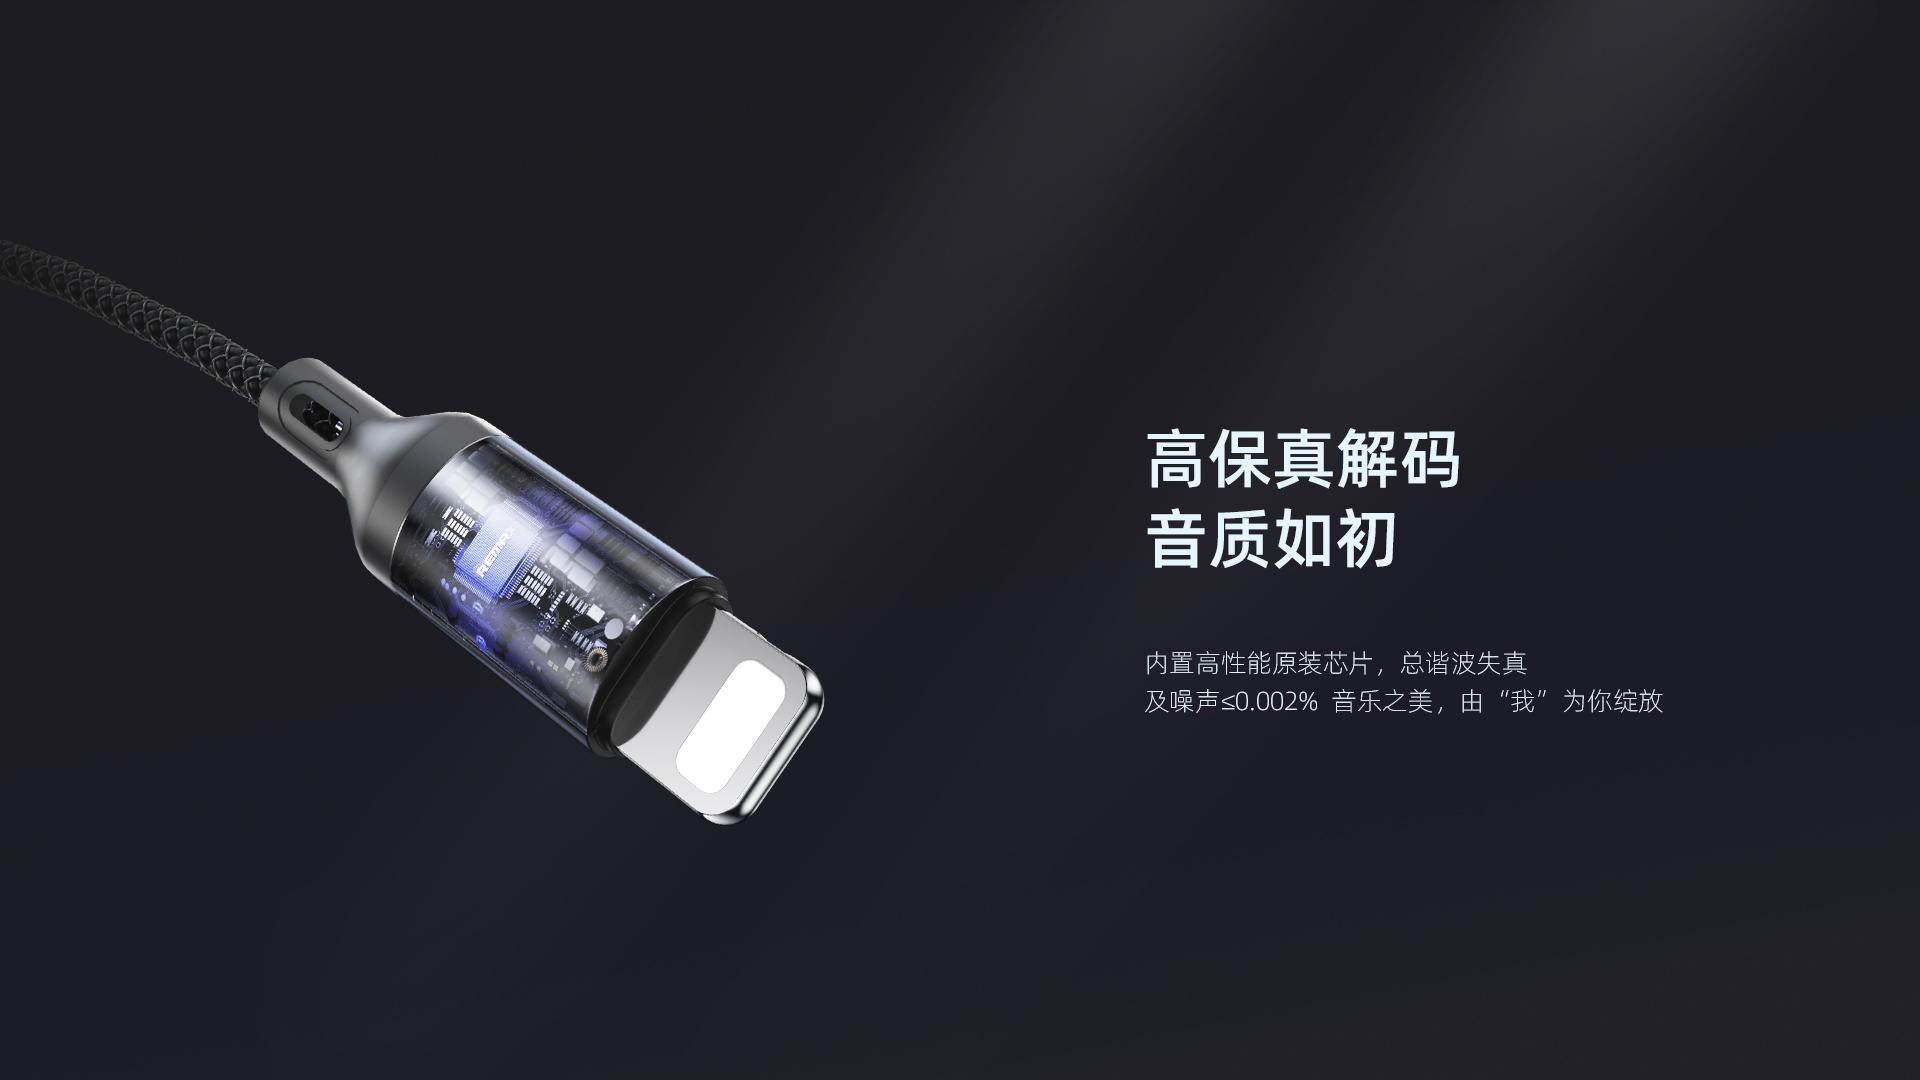 RL-LA13i-速睿音频转接头-网页_02